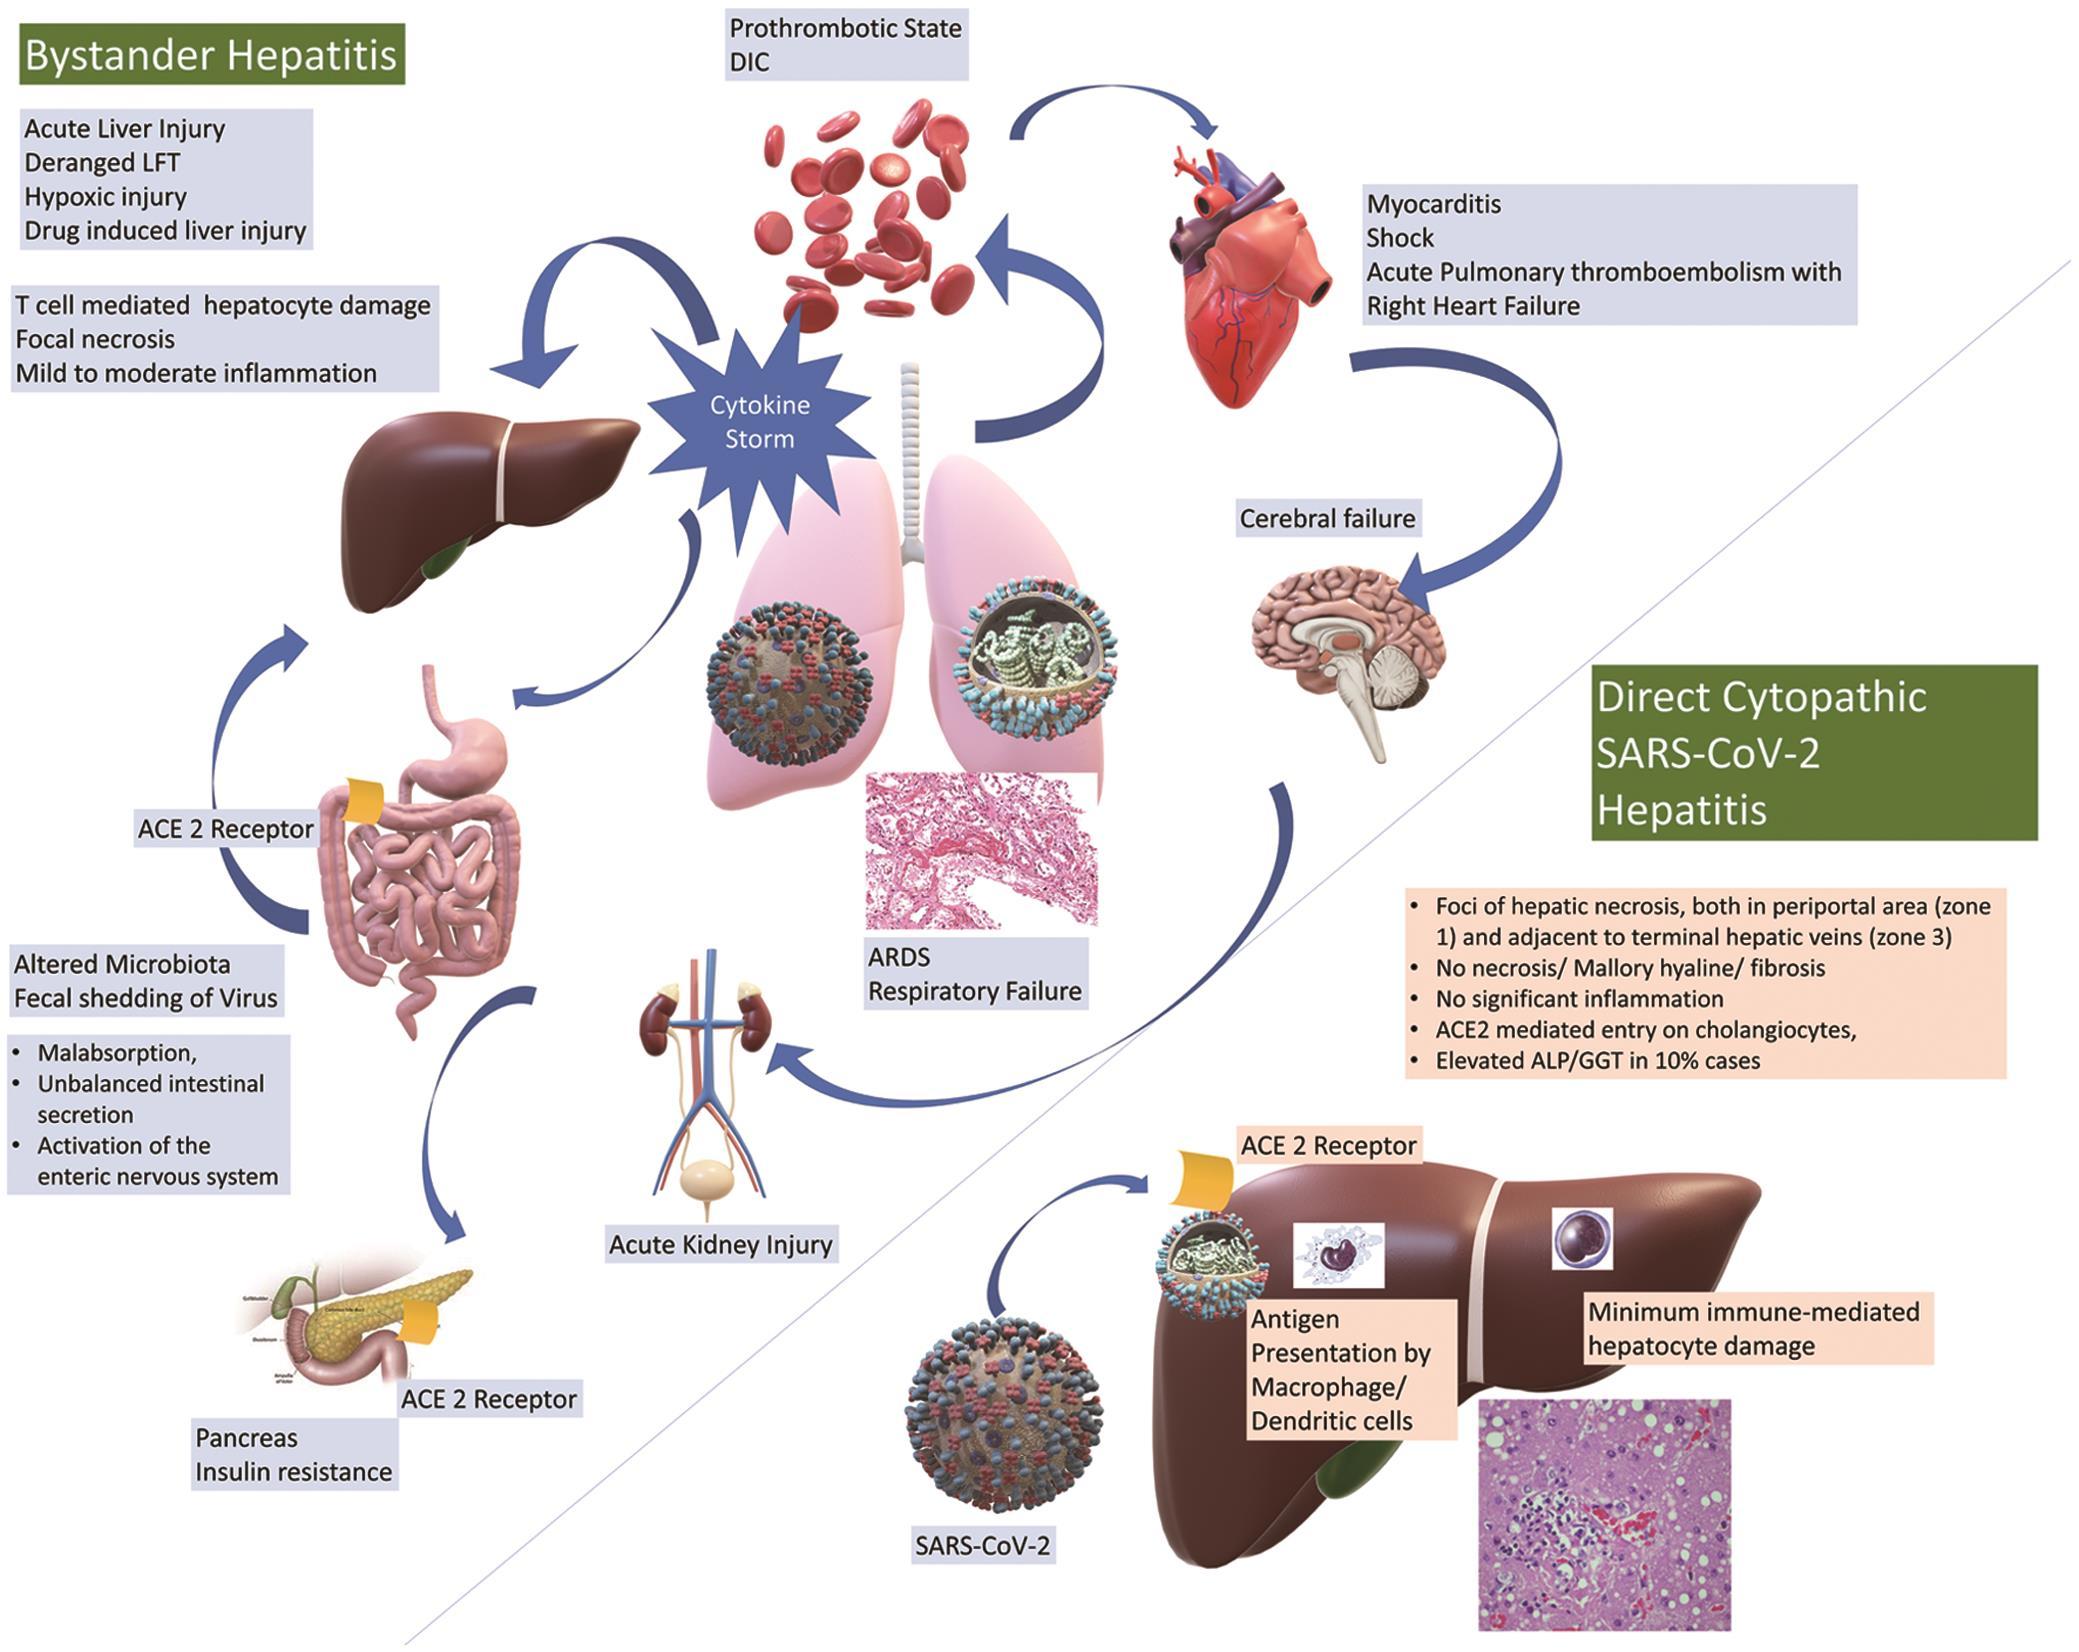 Etiopathogenesis of liver injury in COVID-19.